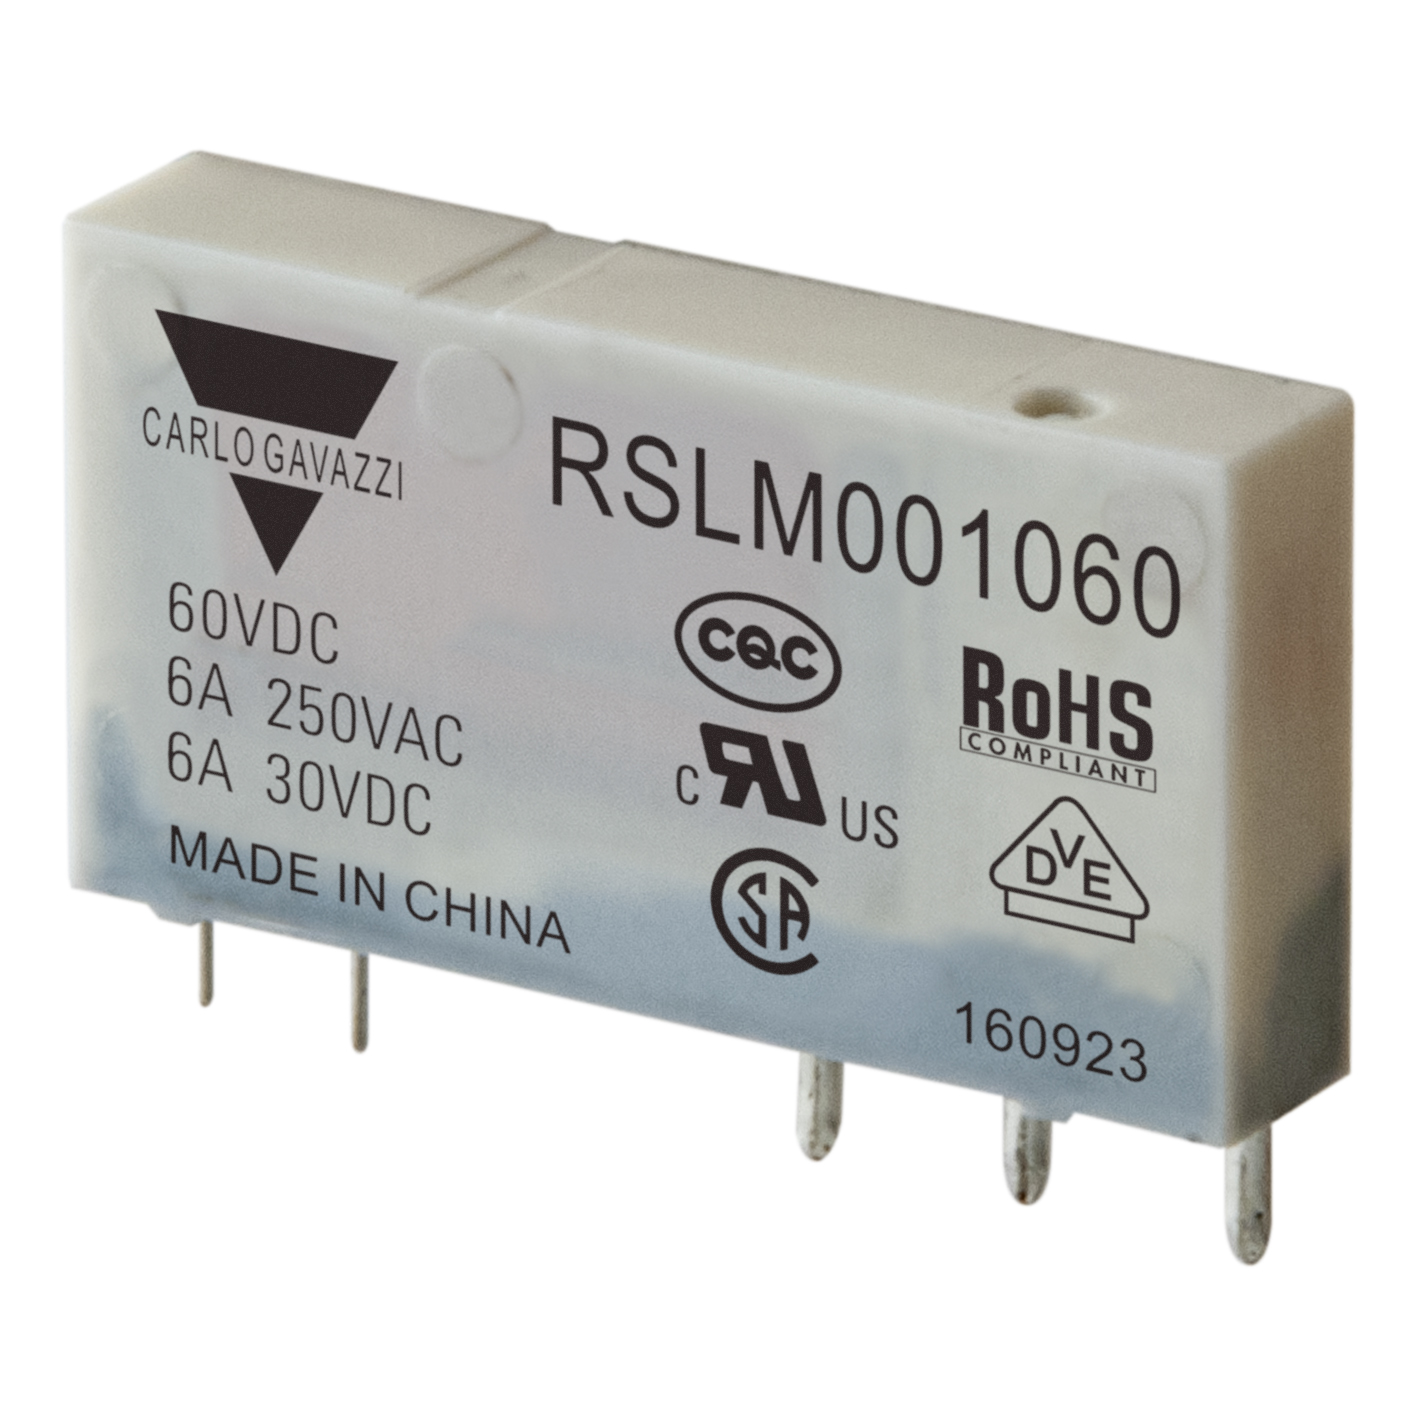 Kompakt indistrirelä RSLM 60VDC